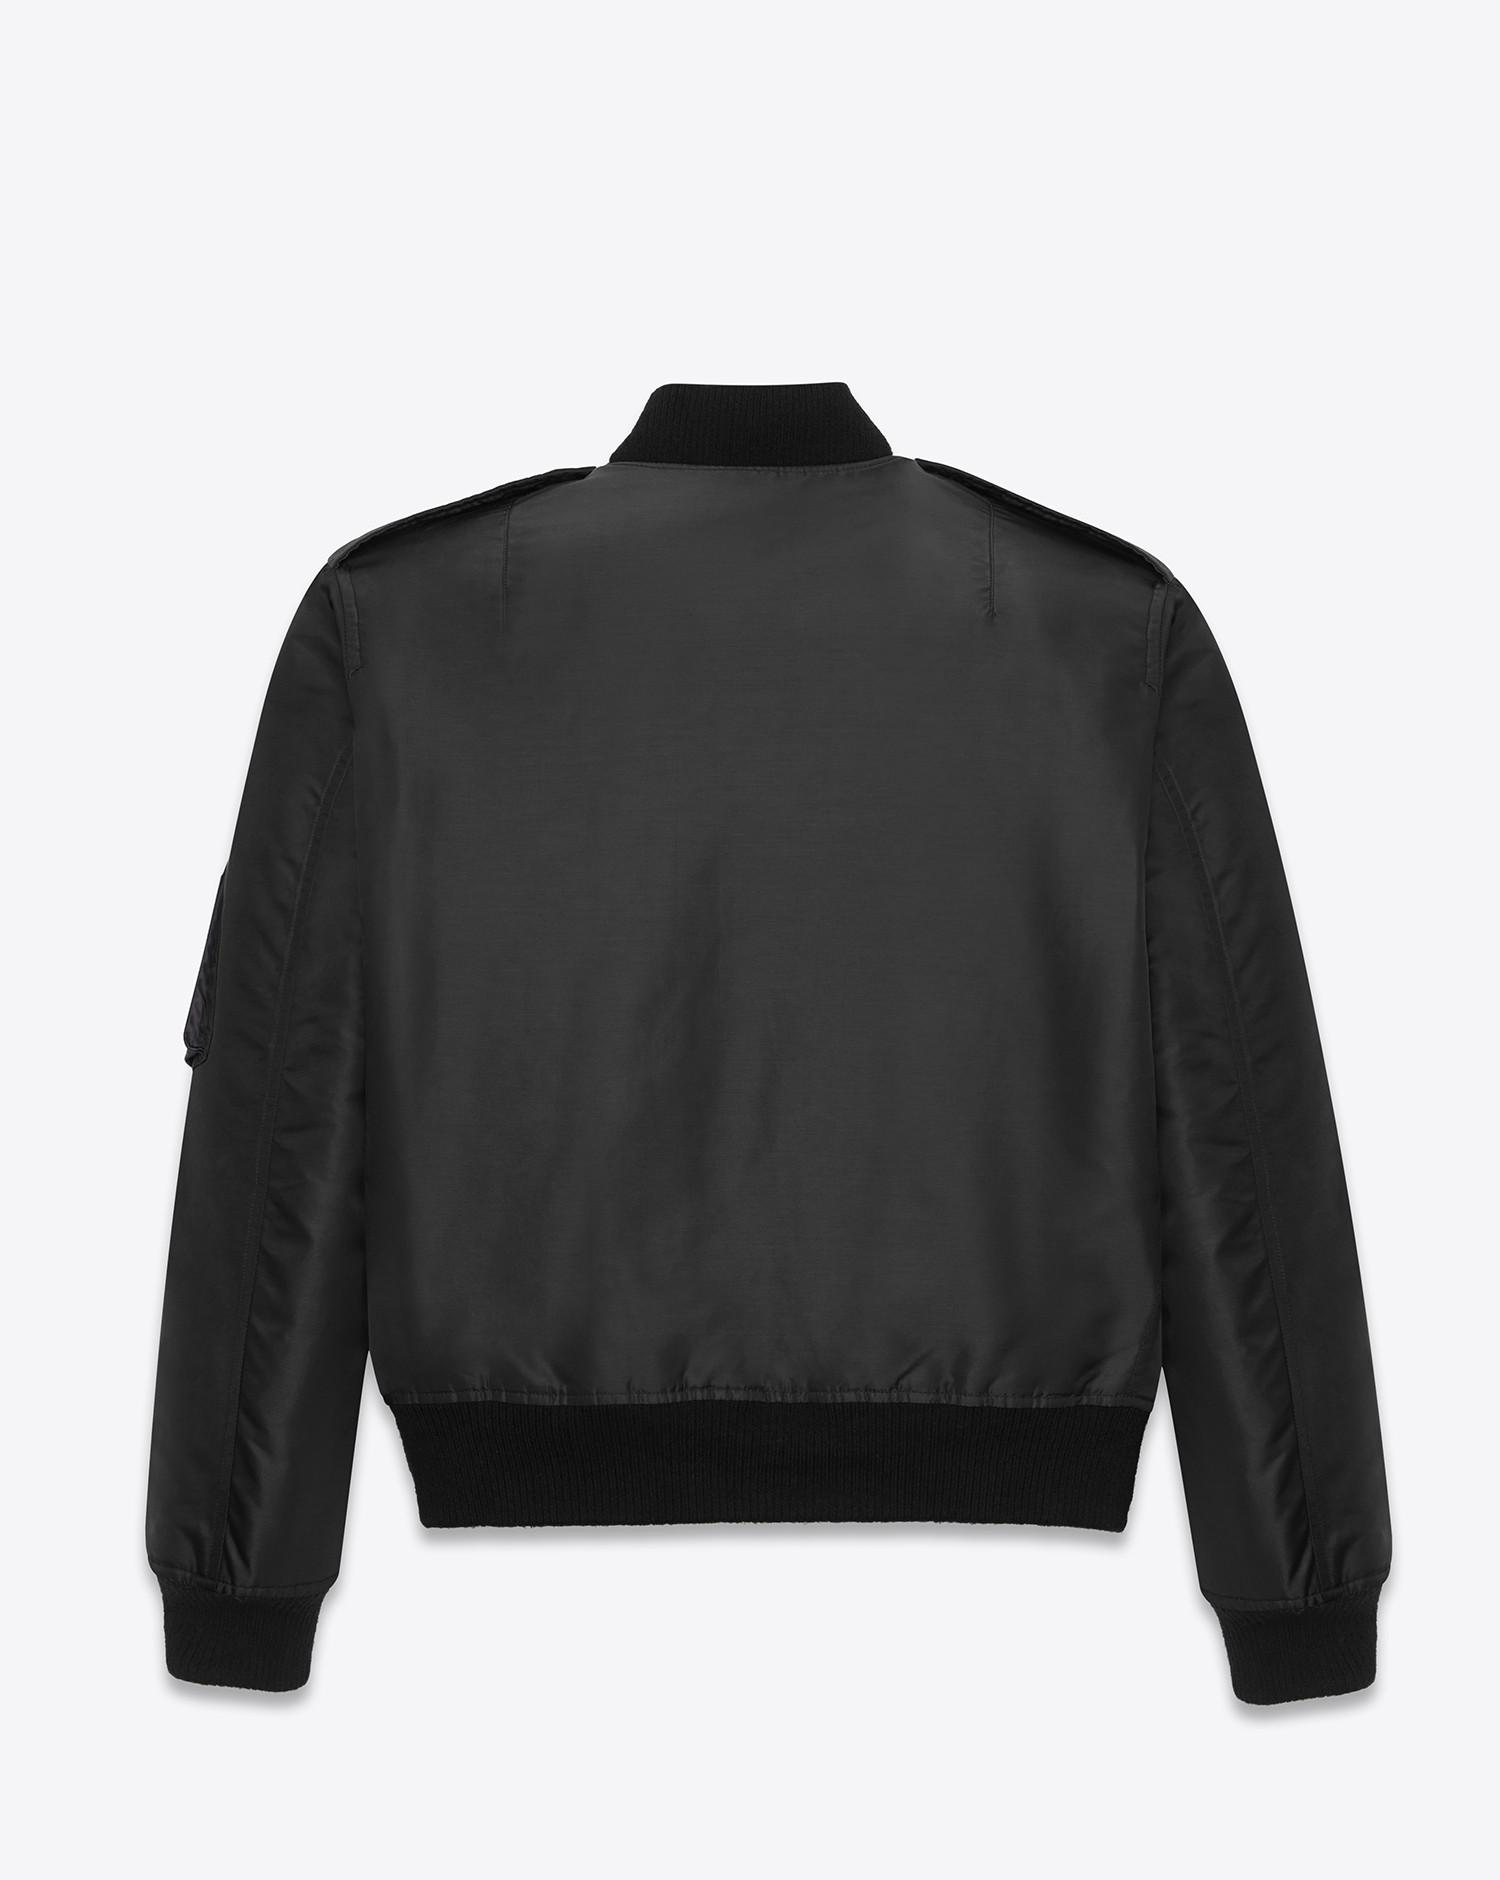 756d7c2a13f2 Lyst - Saint Laurent Bomber Jacket In Nylon in Black for Men - Save 13%